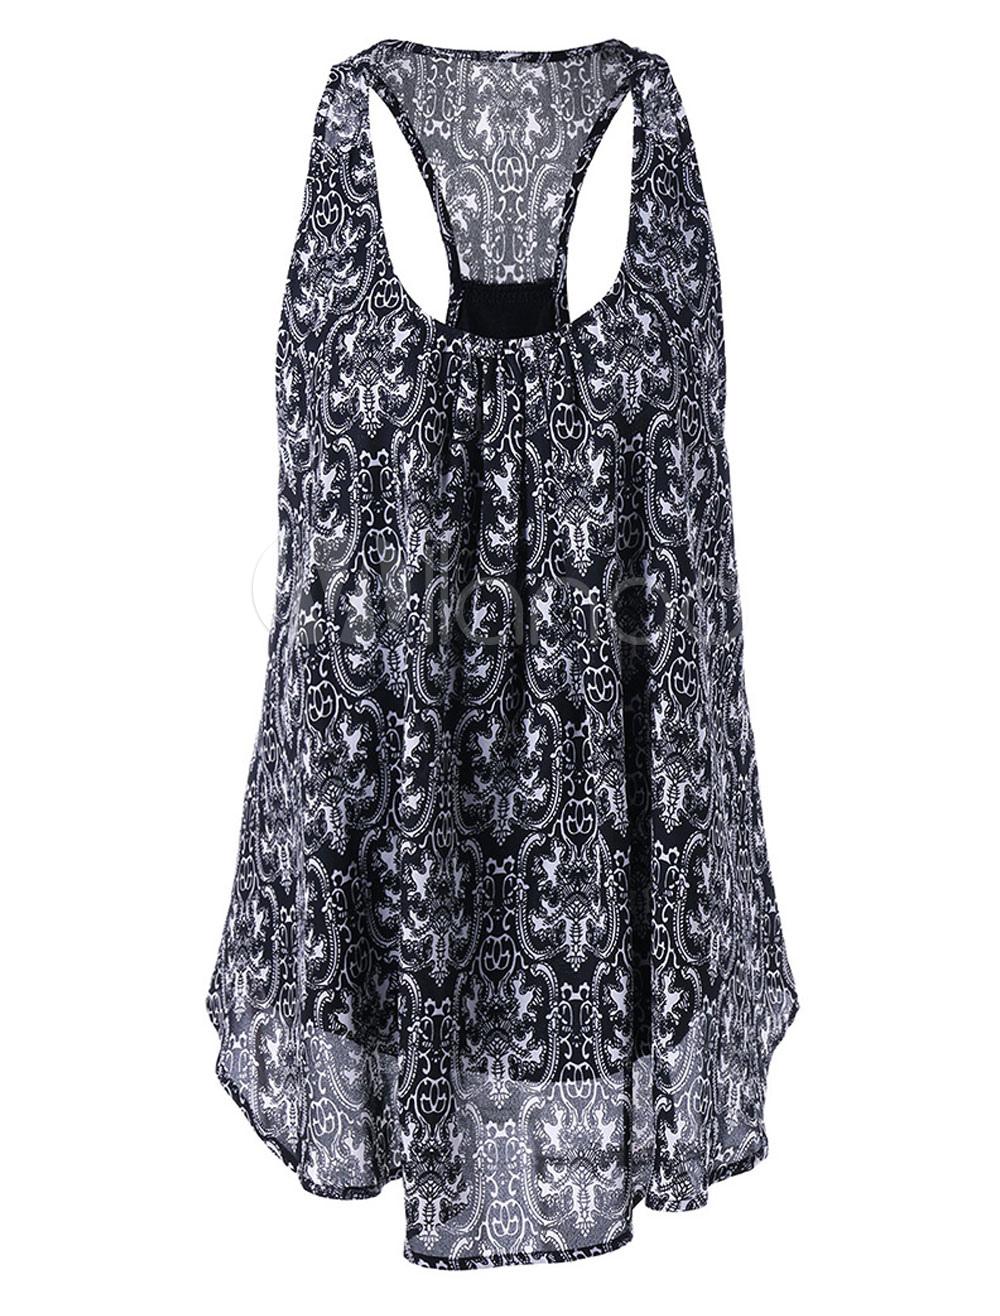 Black Tank Top U Neck Sleeveless Floral Print Layered Asymmetrical Women's Summer Tops